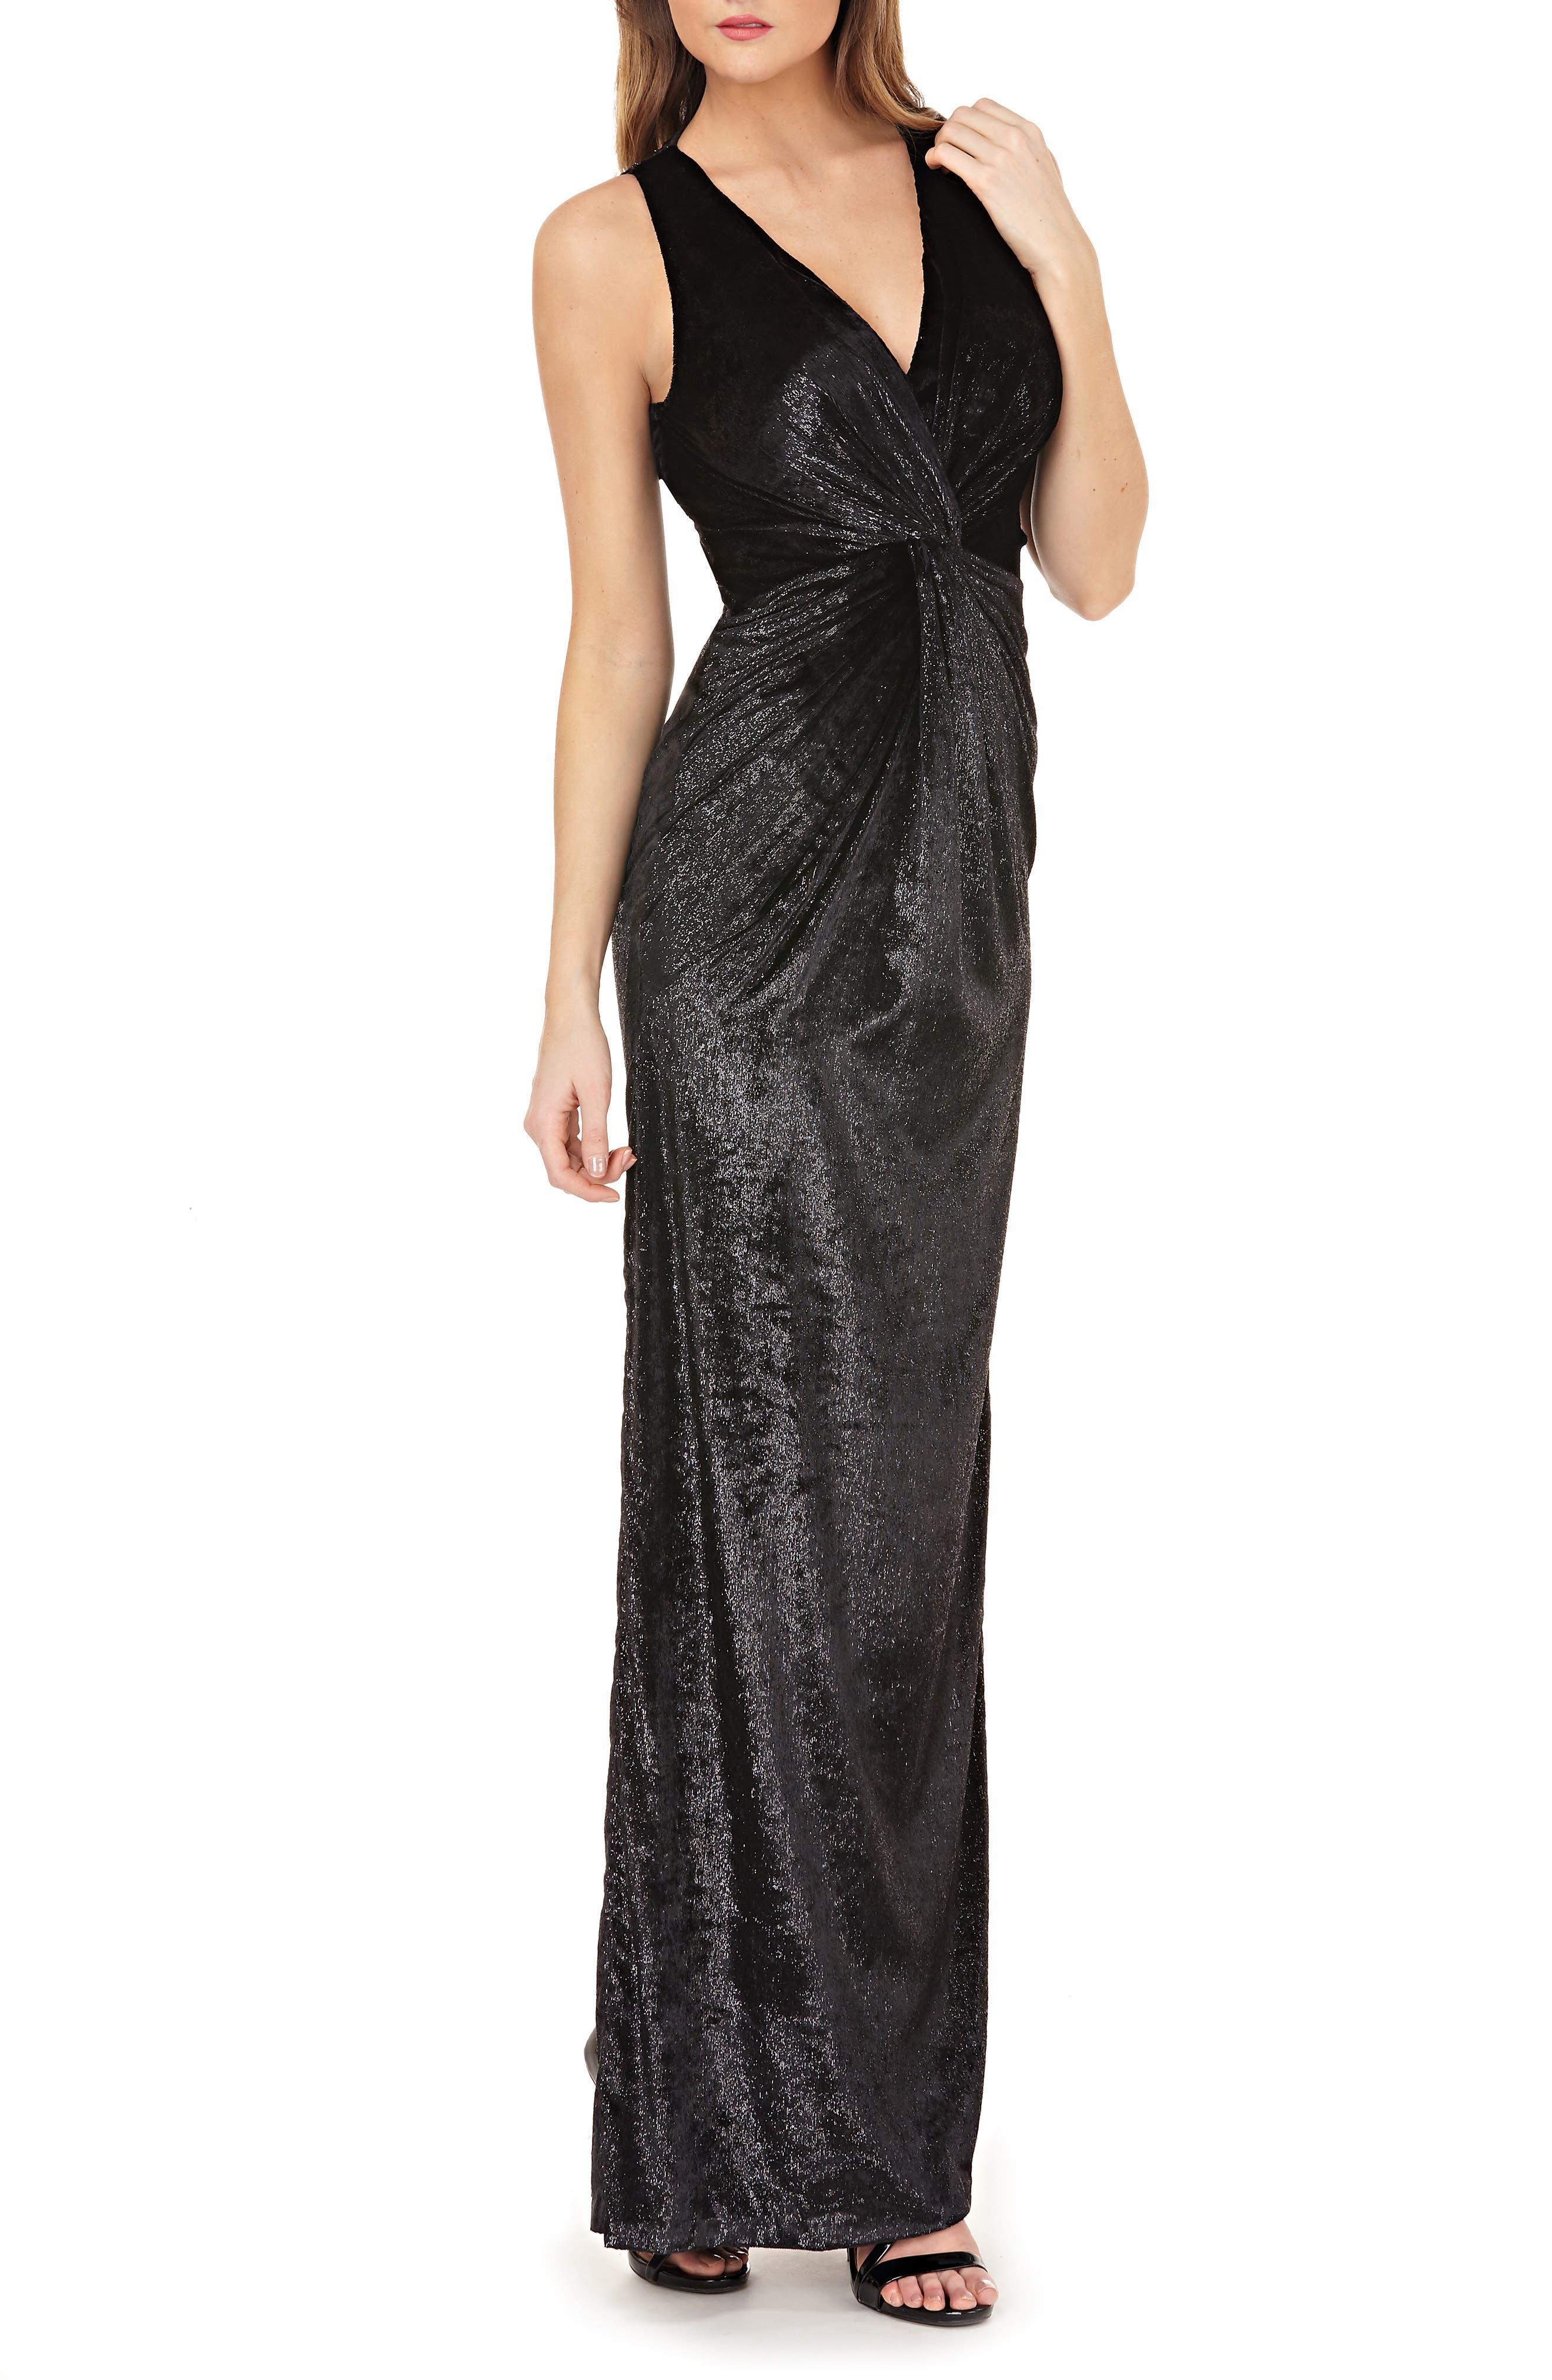 JS COLLECTIONS Sleeveless V-Neck Shiny Velvet Column Gown W/ Twist Detail in Black